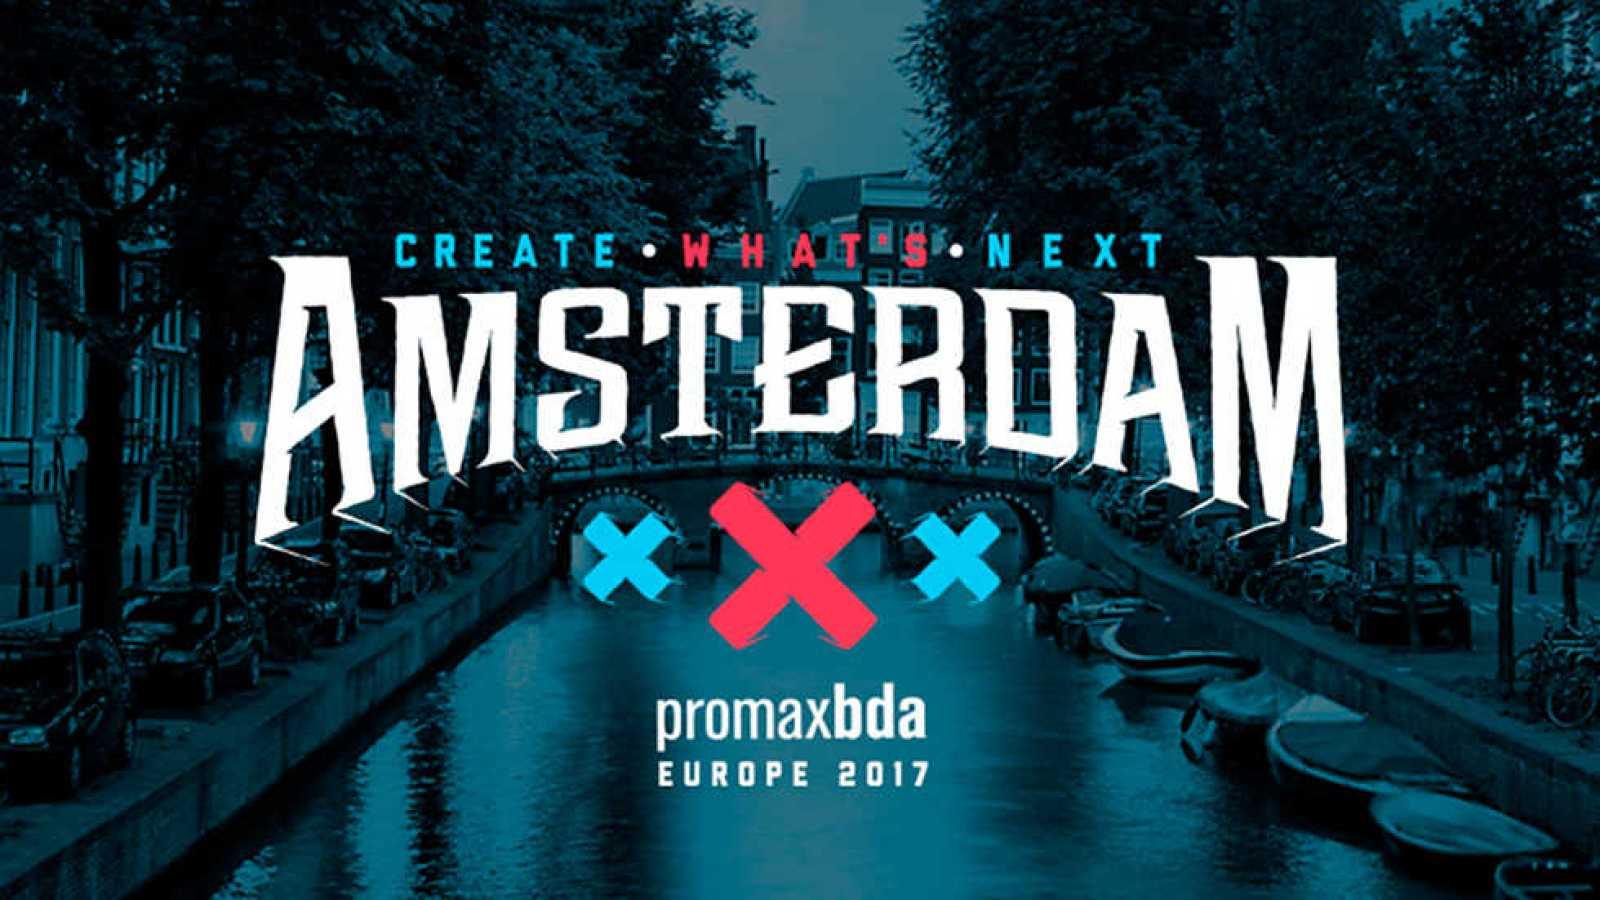 Metrópolis - PromaxBDA Amsterdam 2017 - ver ahora